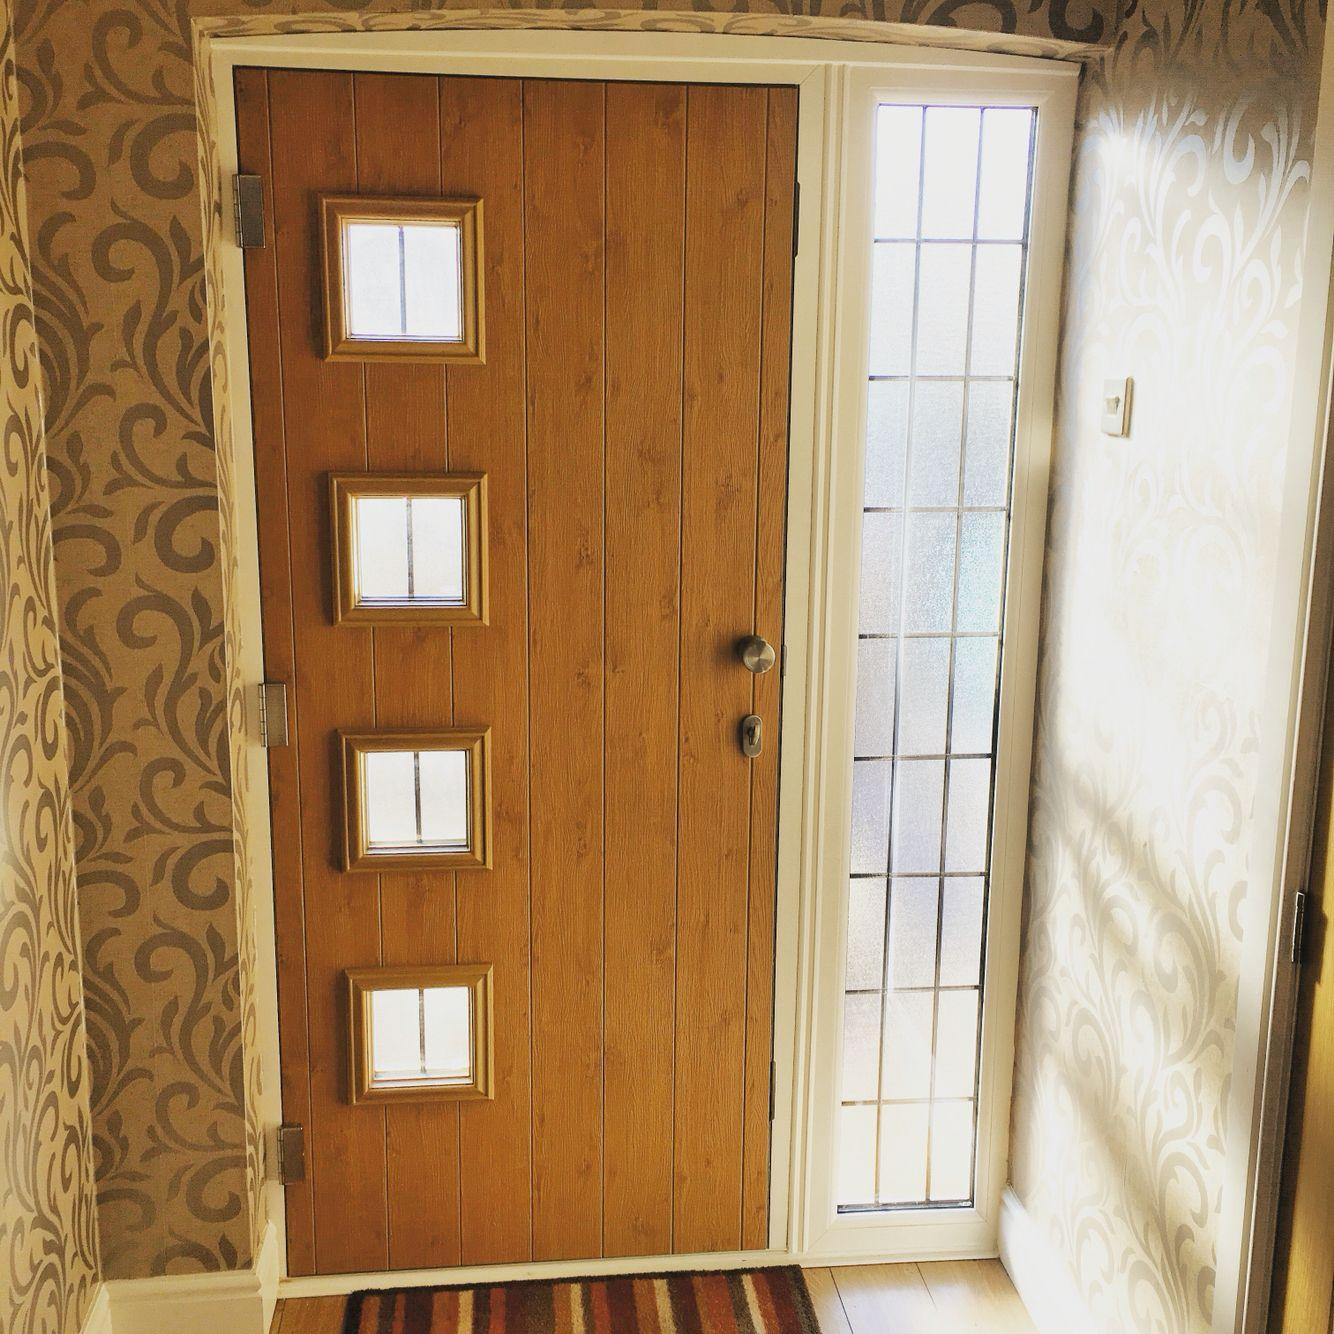 front doors with side panelsSolidor Composite Front Door and Side Panel Milano Solidor in